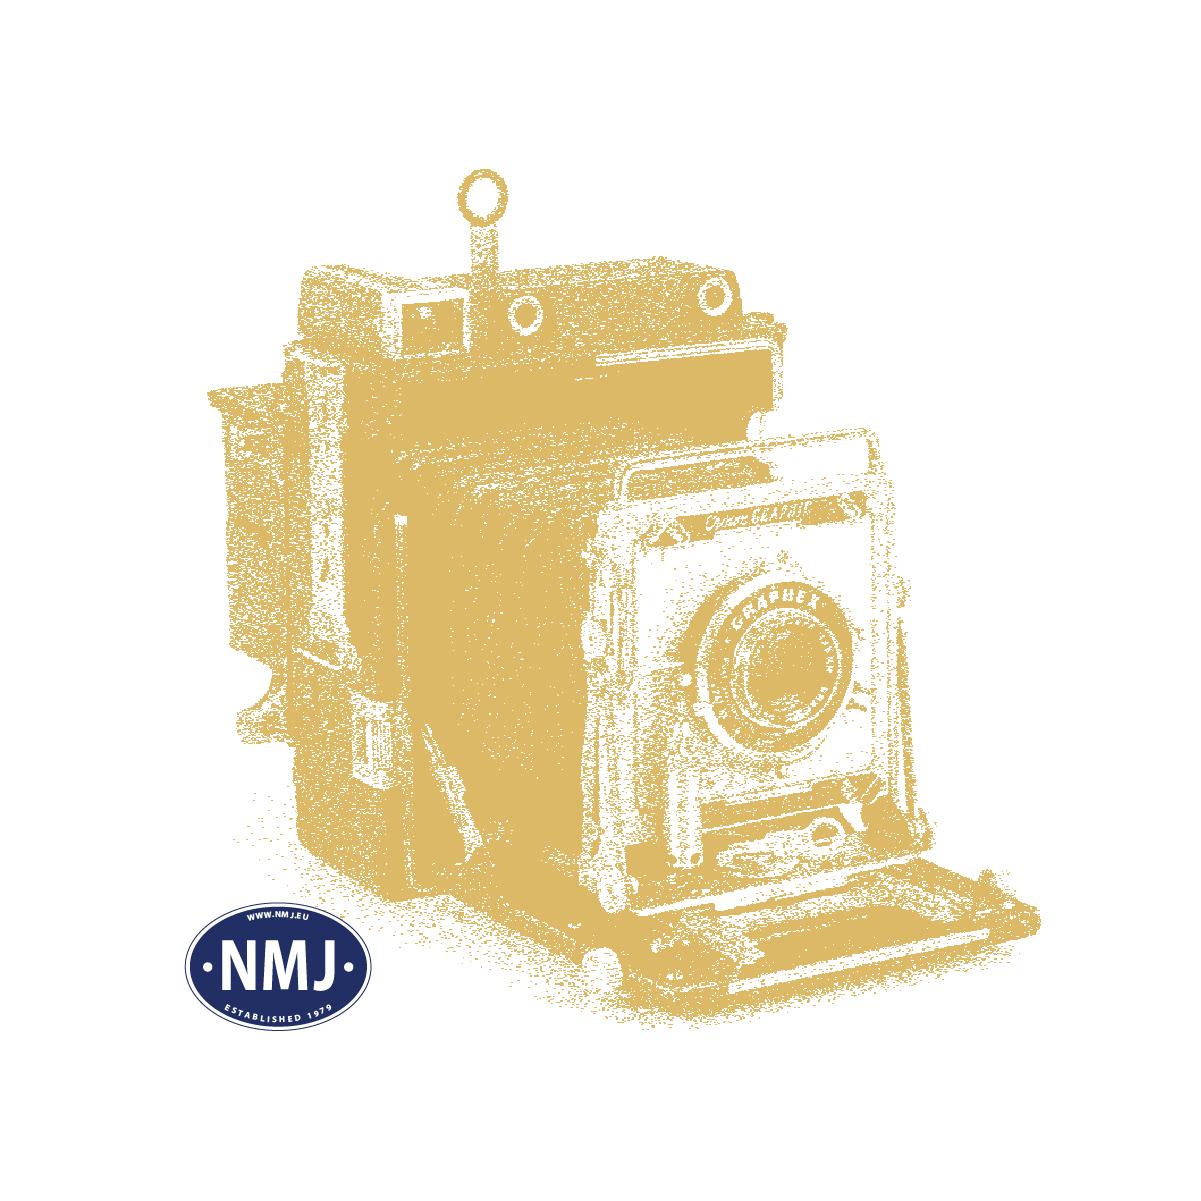 MANZ001A - Penselholder m/ Liten Malepalett, Klar